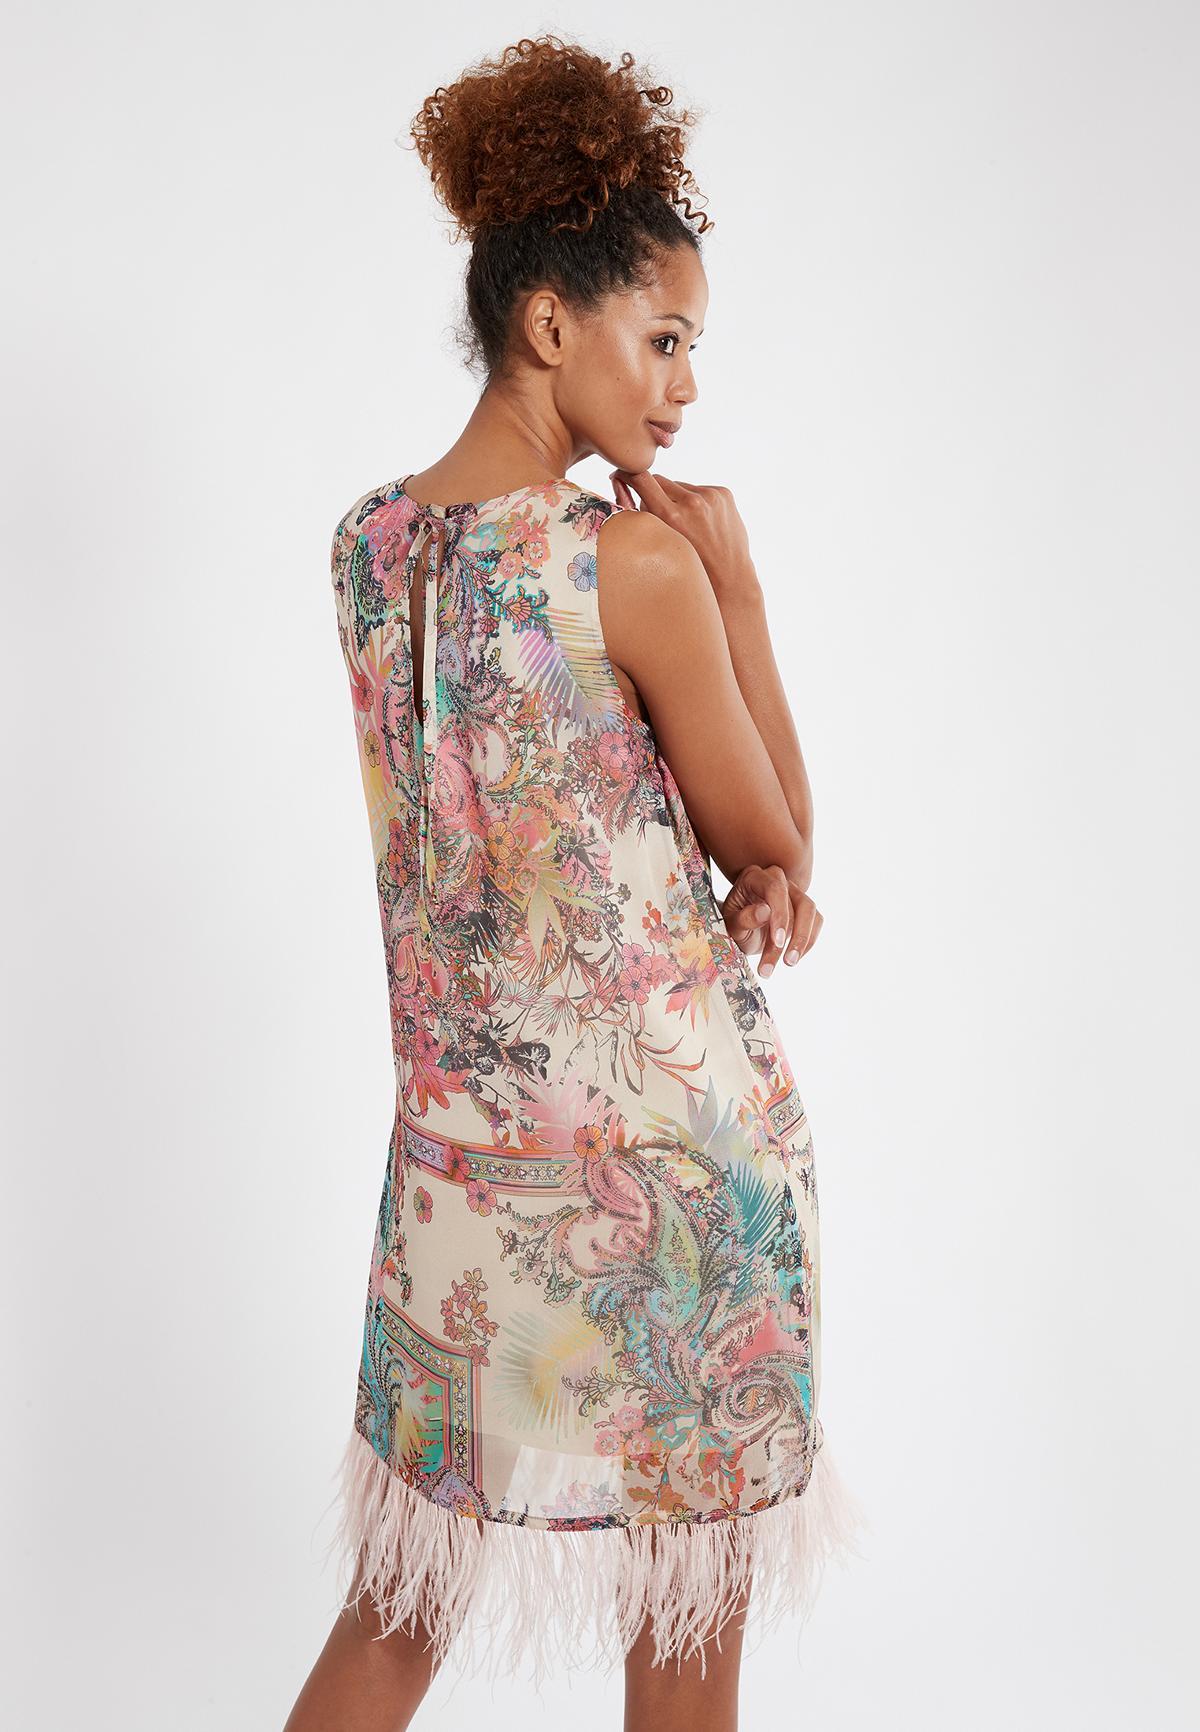 Rear view of Ana Alcazar A-Shaped Dress Sekato Beige  worn by model